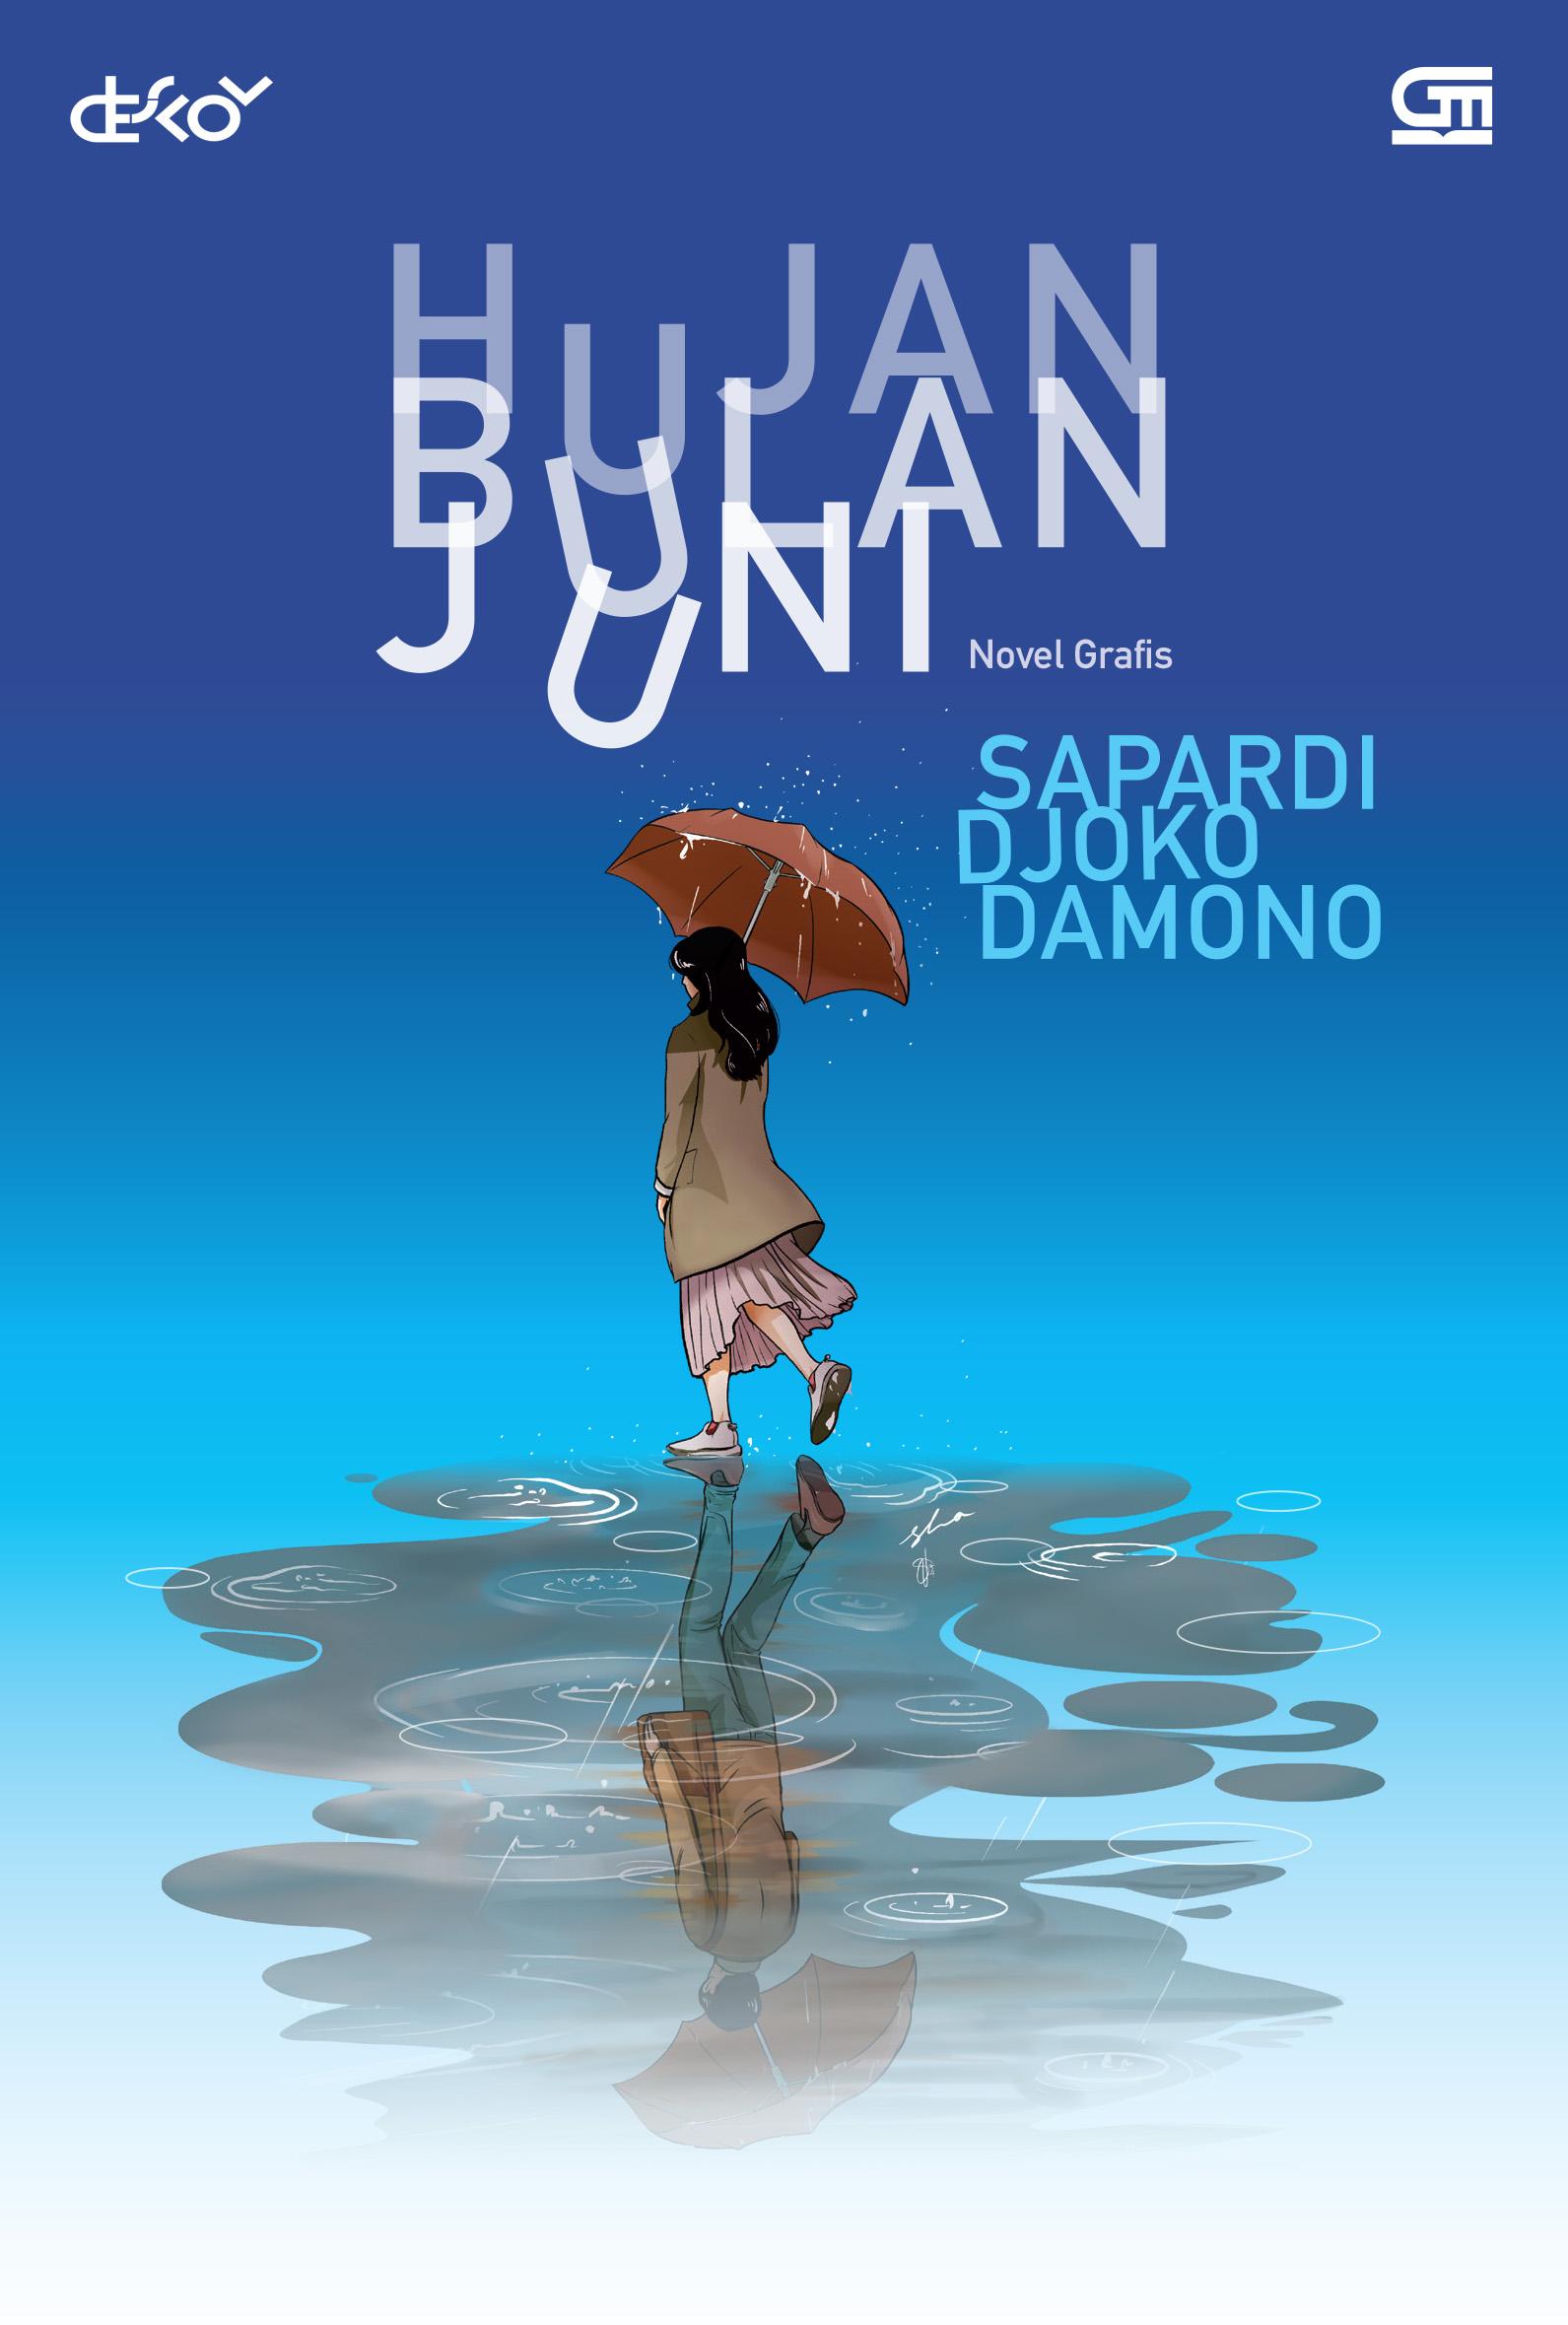 Novel Grafis Hujan Bulan Juni